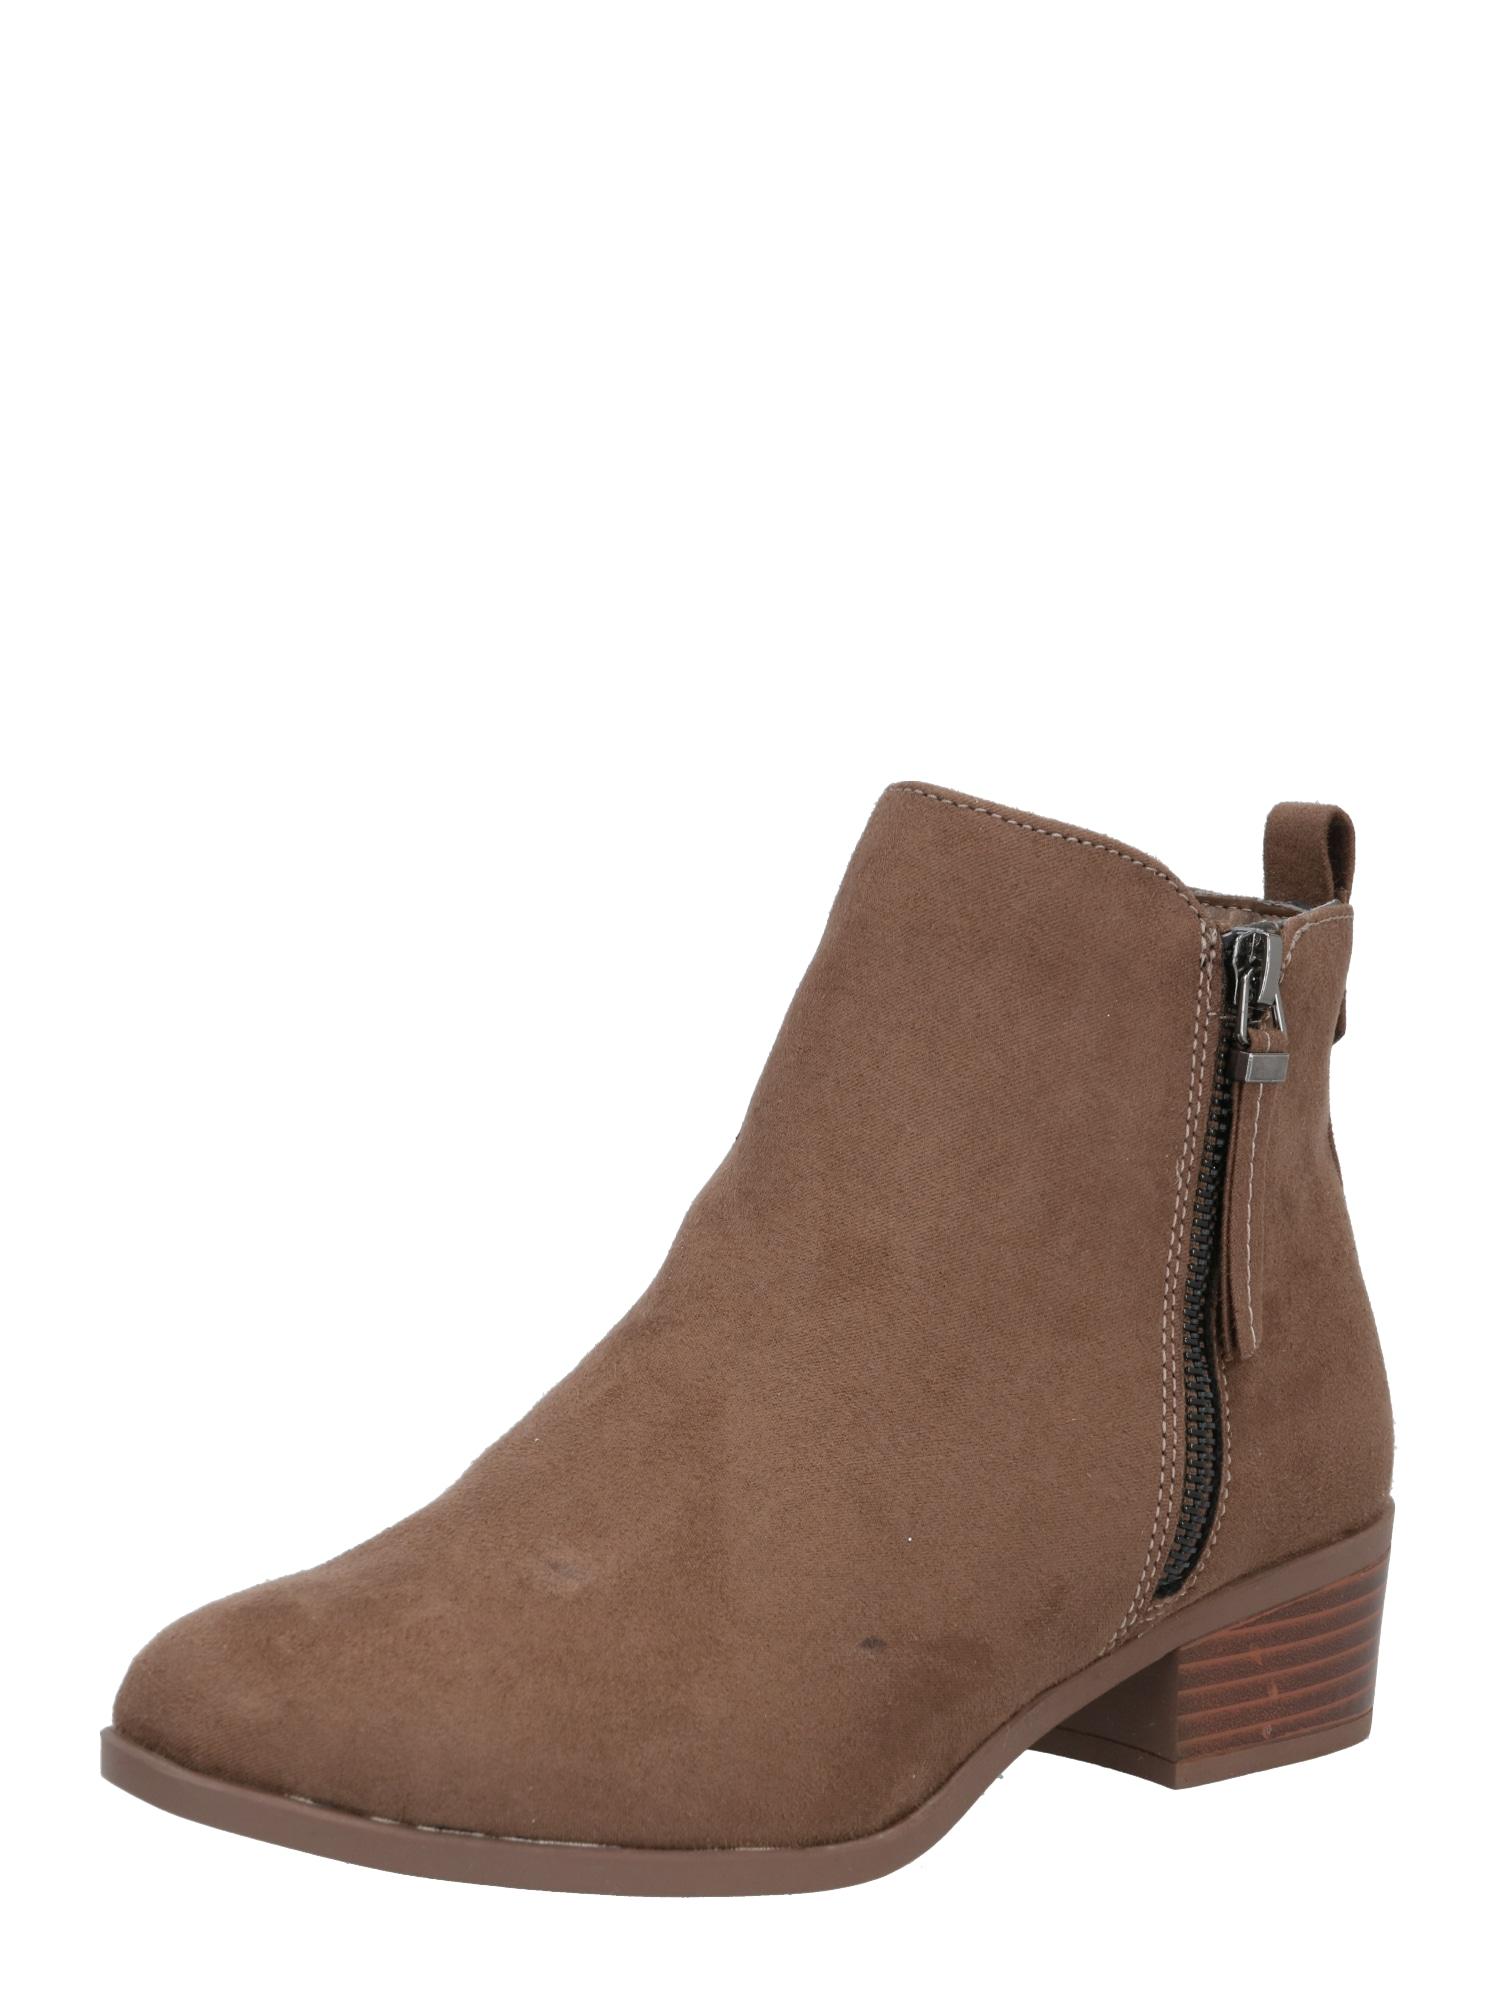 Dorothy Perkins Kulkšnis dengiantys batai ruda